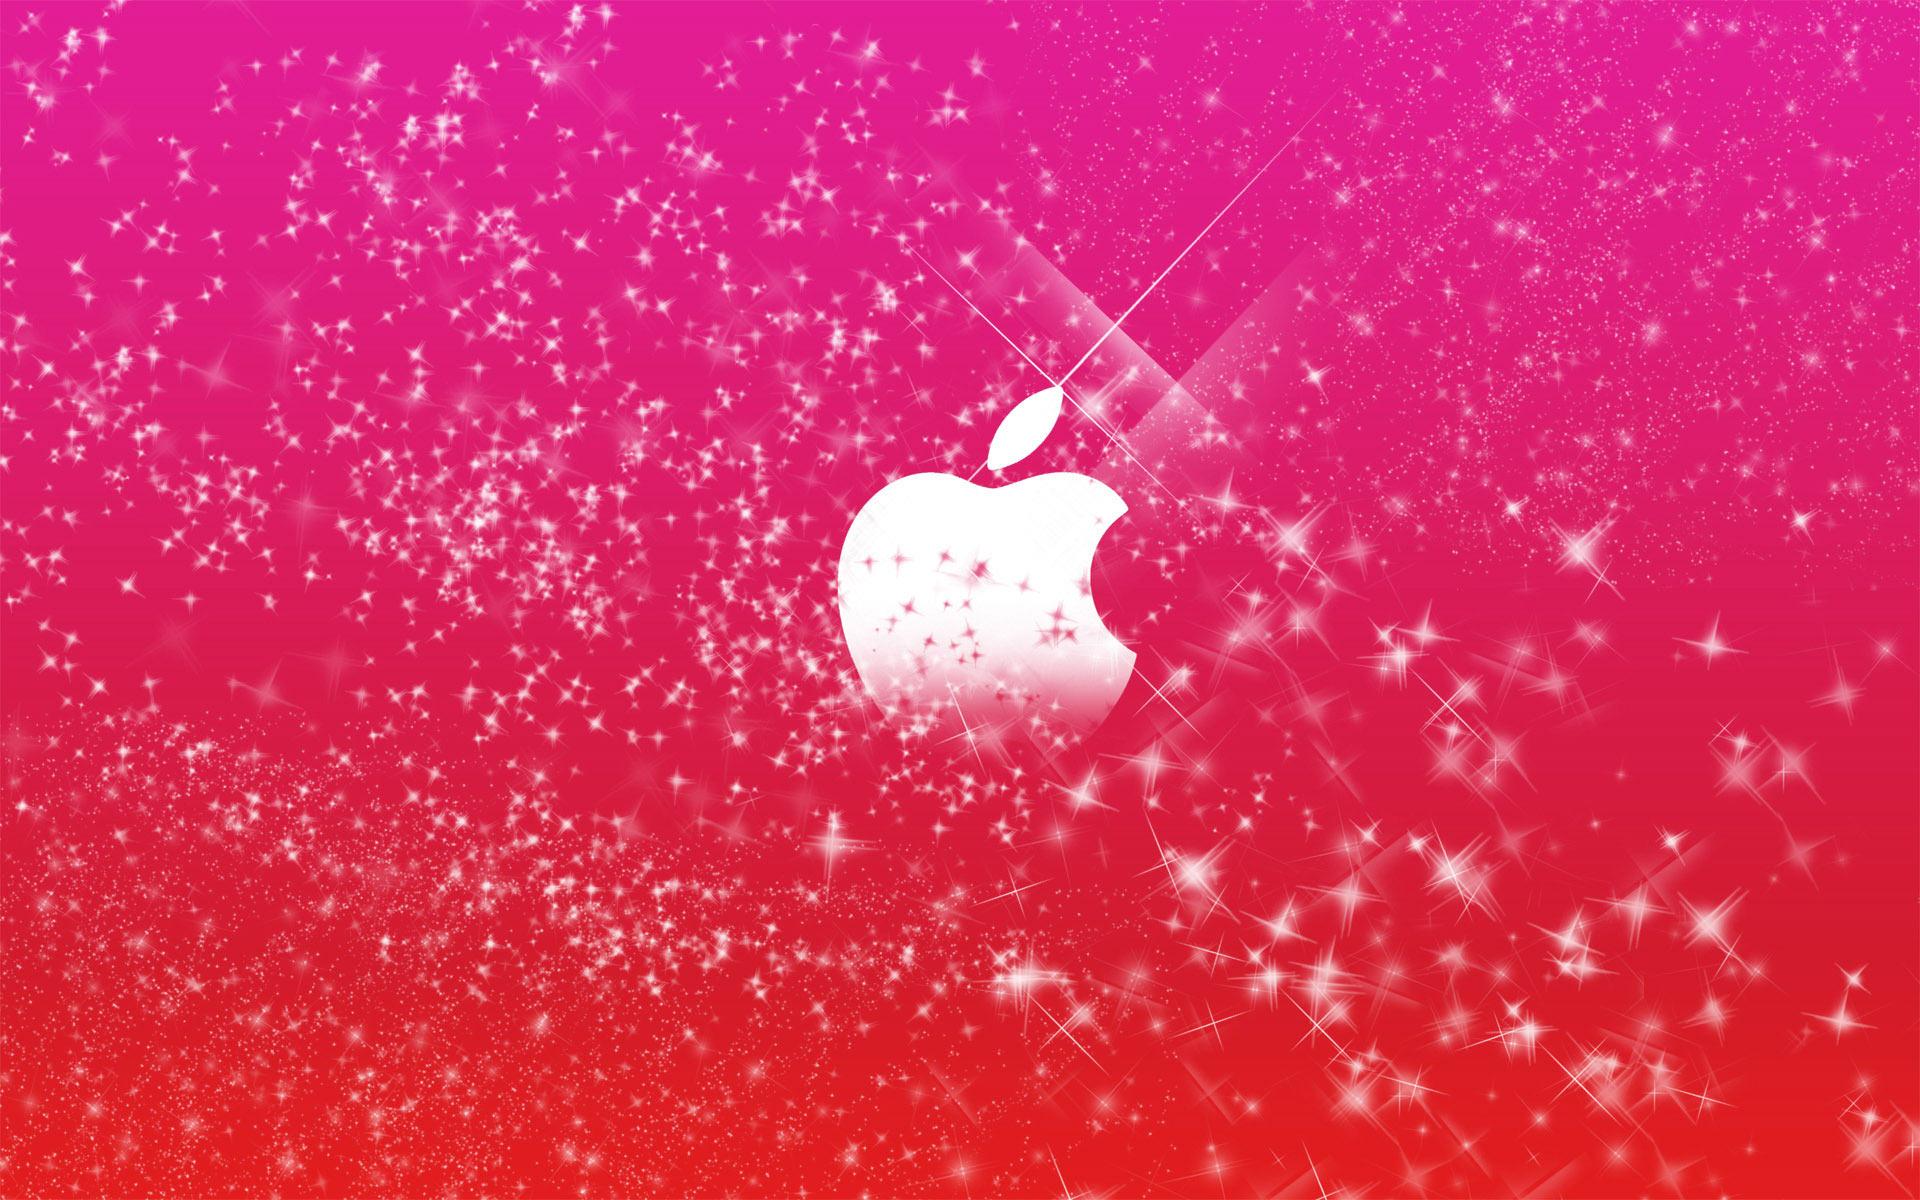 pink glitter background tumblr MEMEs 1920x1200